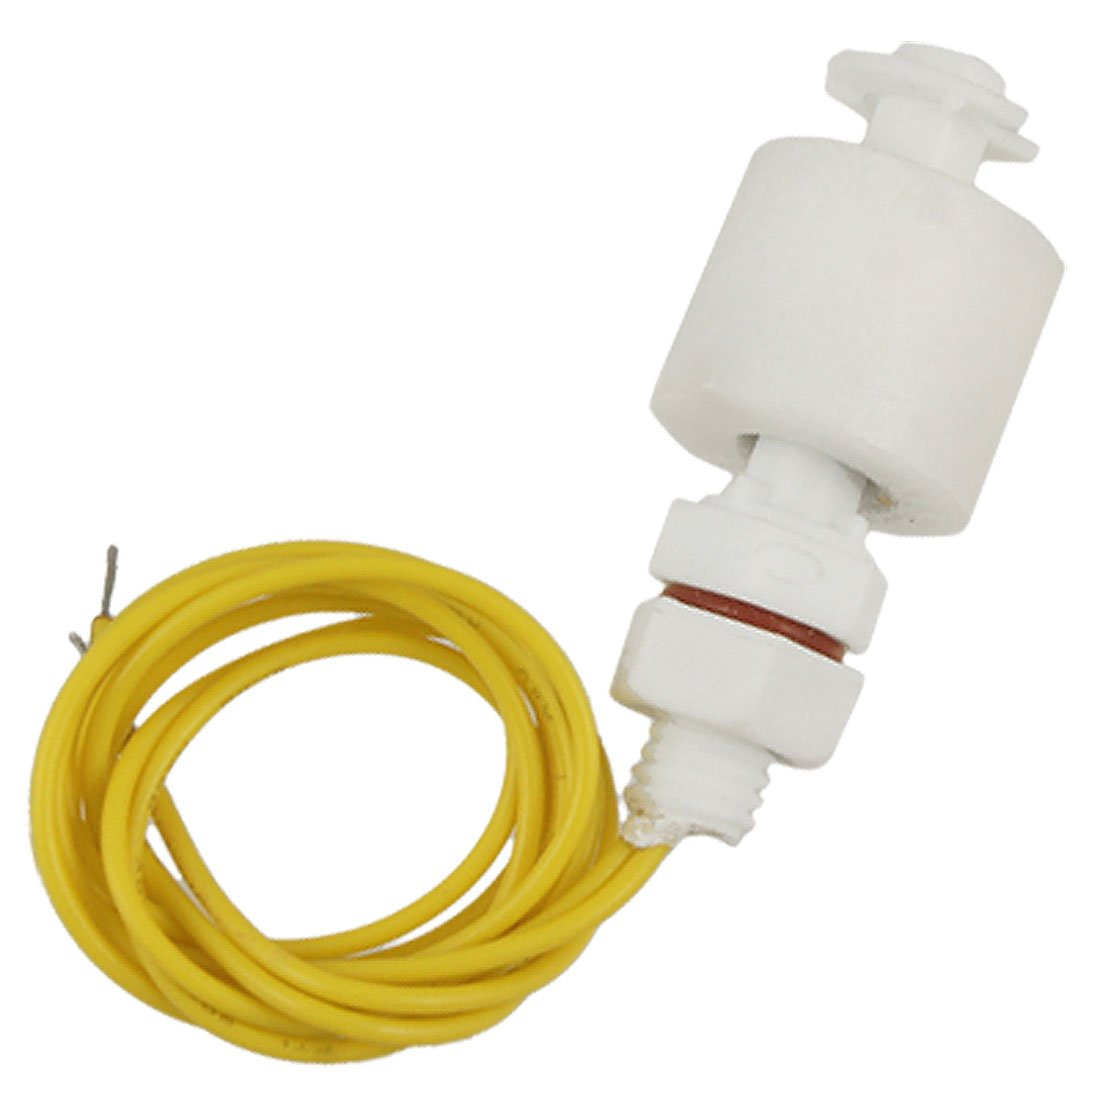 Diseñ o de pecera Indicador de nivel de agua interruptor flotante Control de plá stico Sourcingmap a11050900ux0313